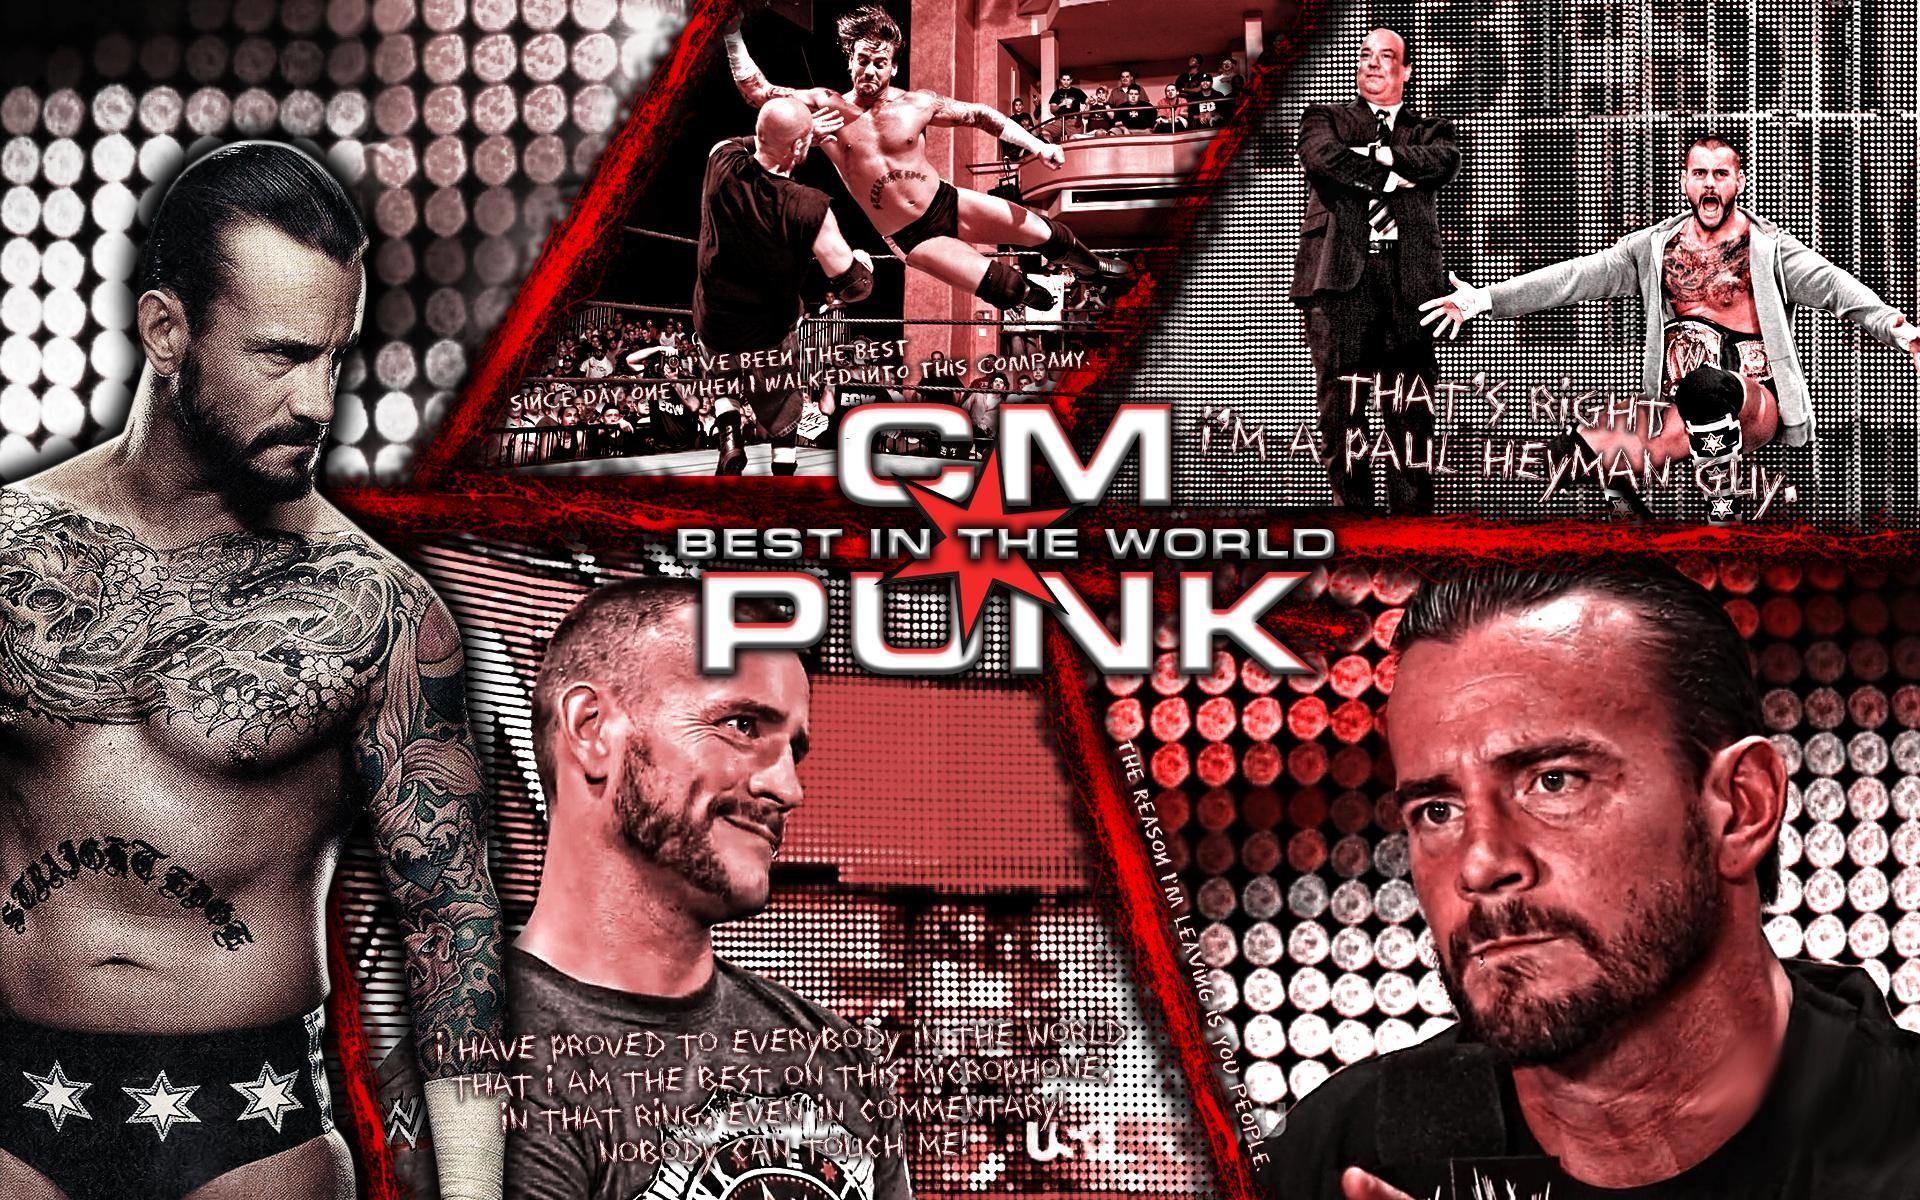 WWE HD Wallpapers Backgrounds Wallpaper | HD Wallpapers | Pinterest | Hd  wallpaper, Wallpaper and Wallpaper backgrounds